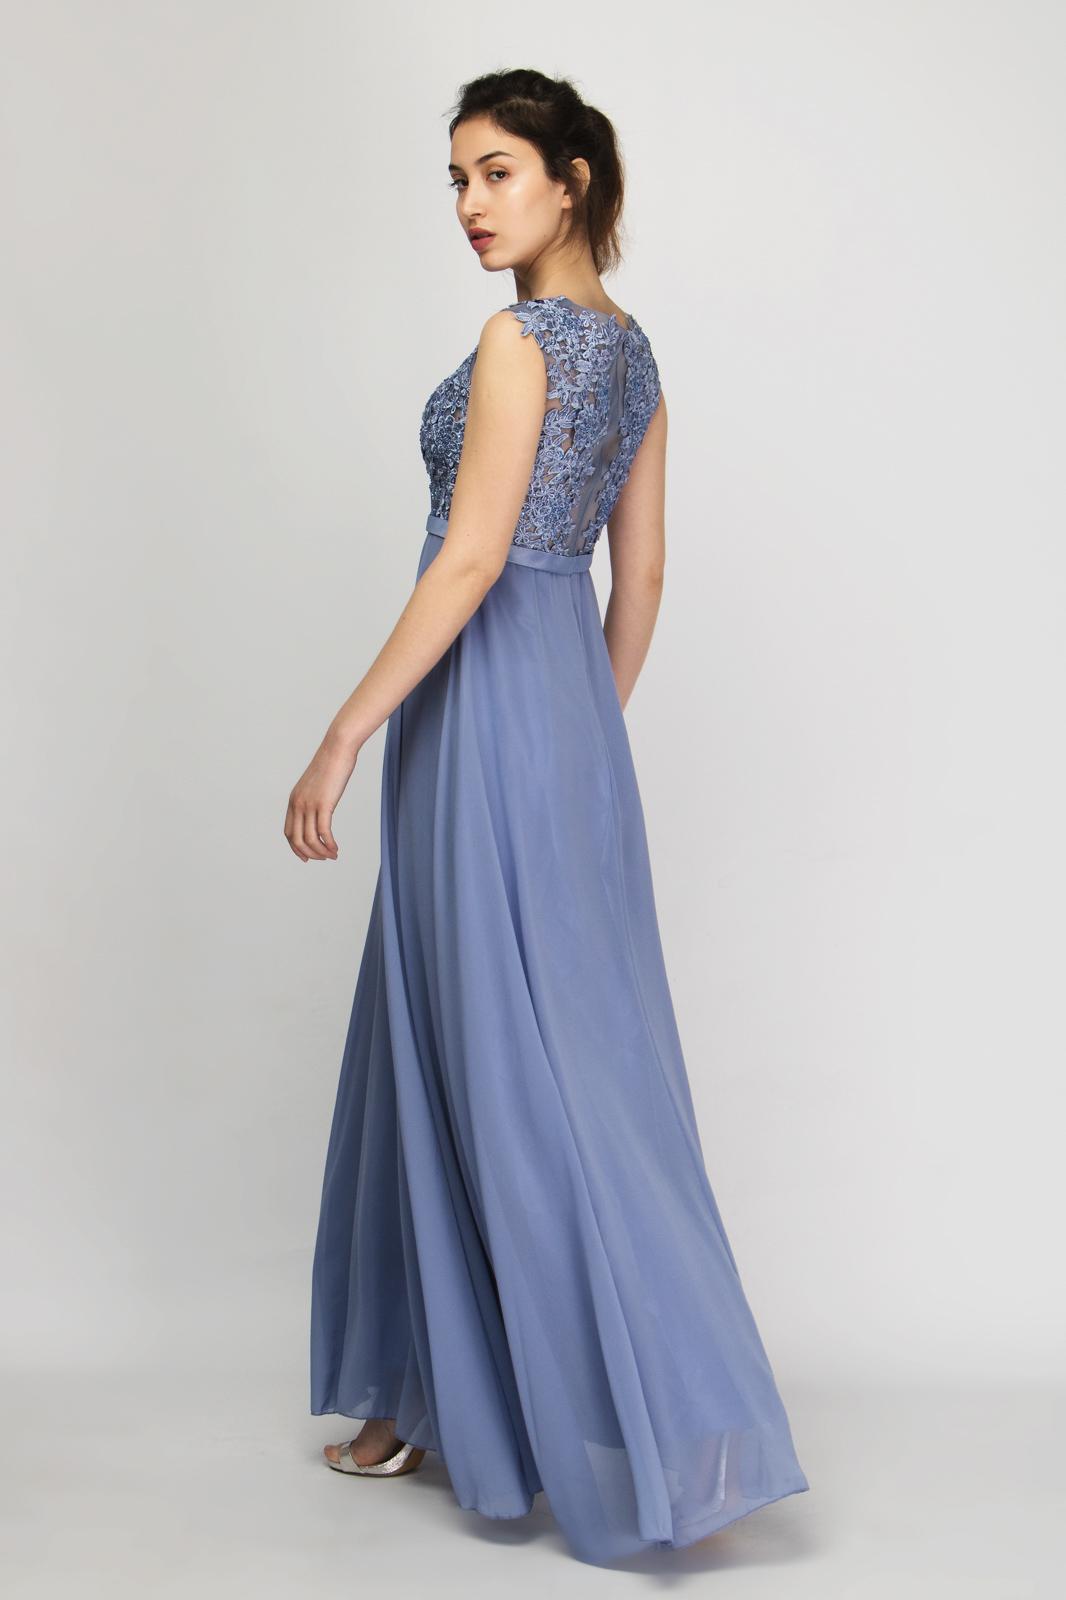 cc6fd4b6d94e Μάξι Φόρεμα Chiffon με Δαντέλα και Strass